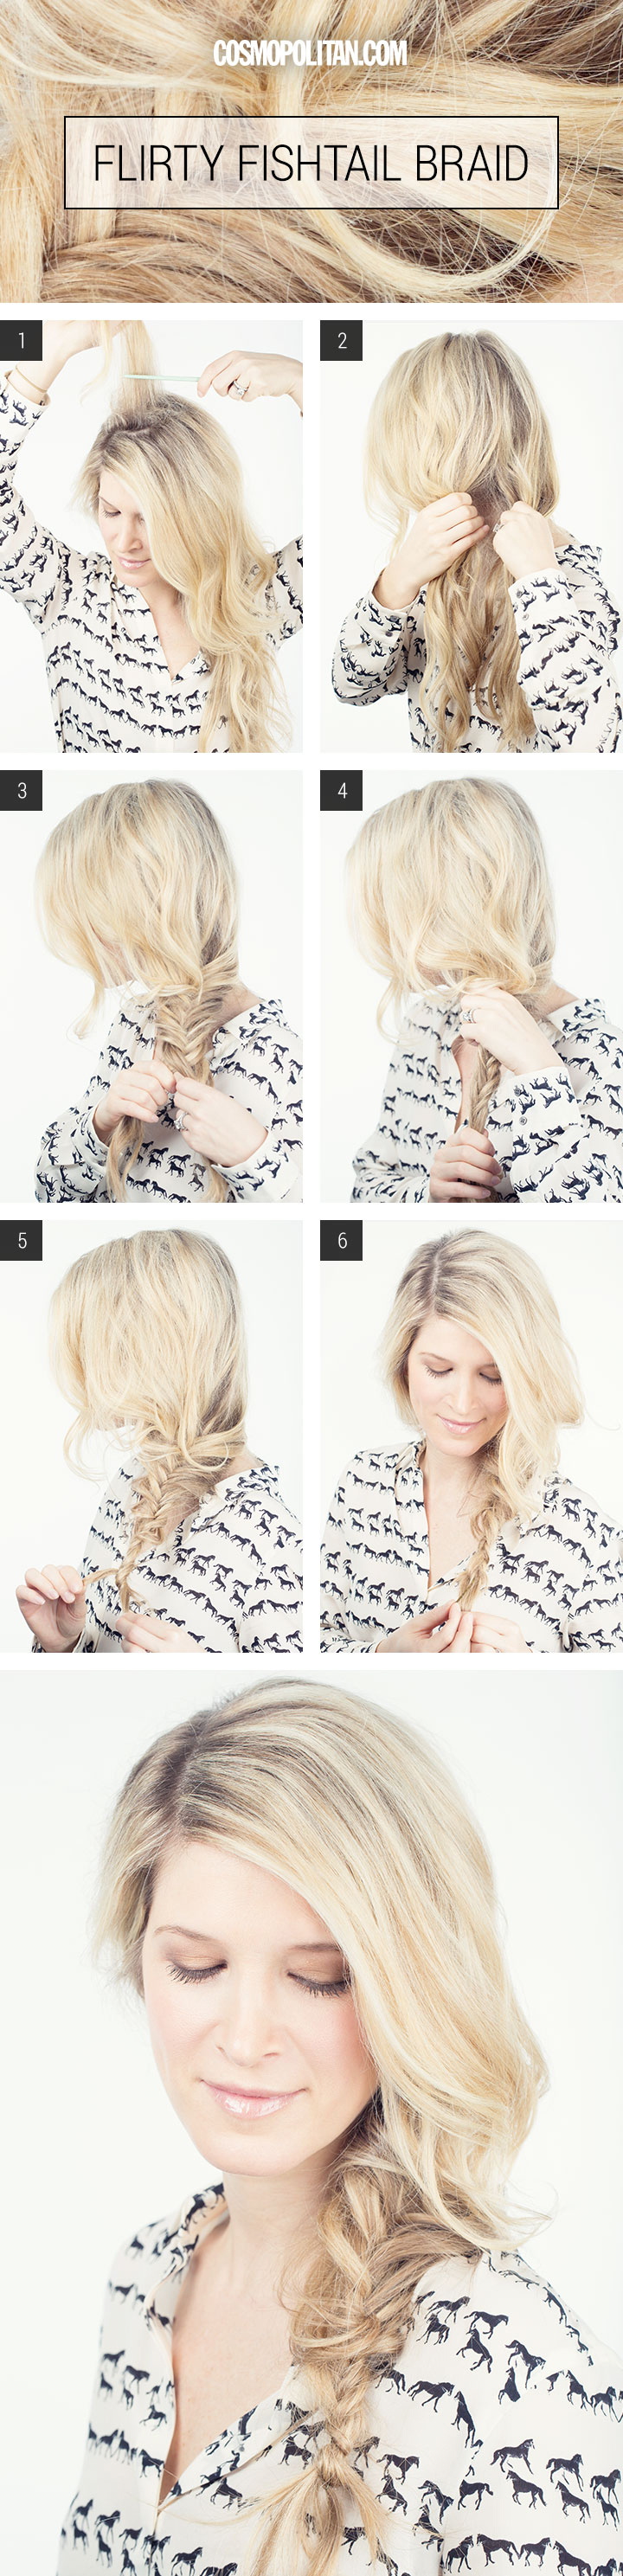 Hair Tutorials: Easy Hairstyles for Women